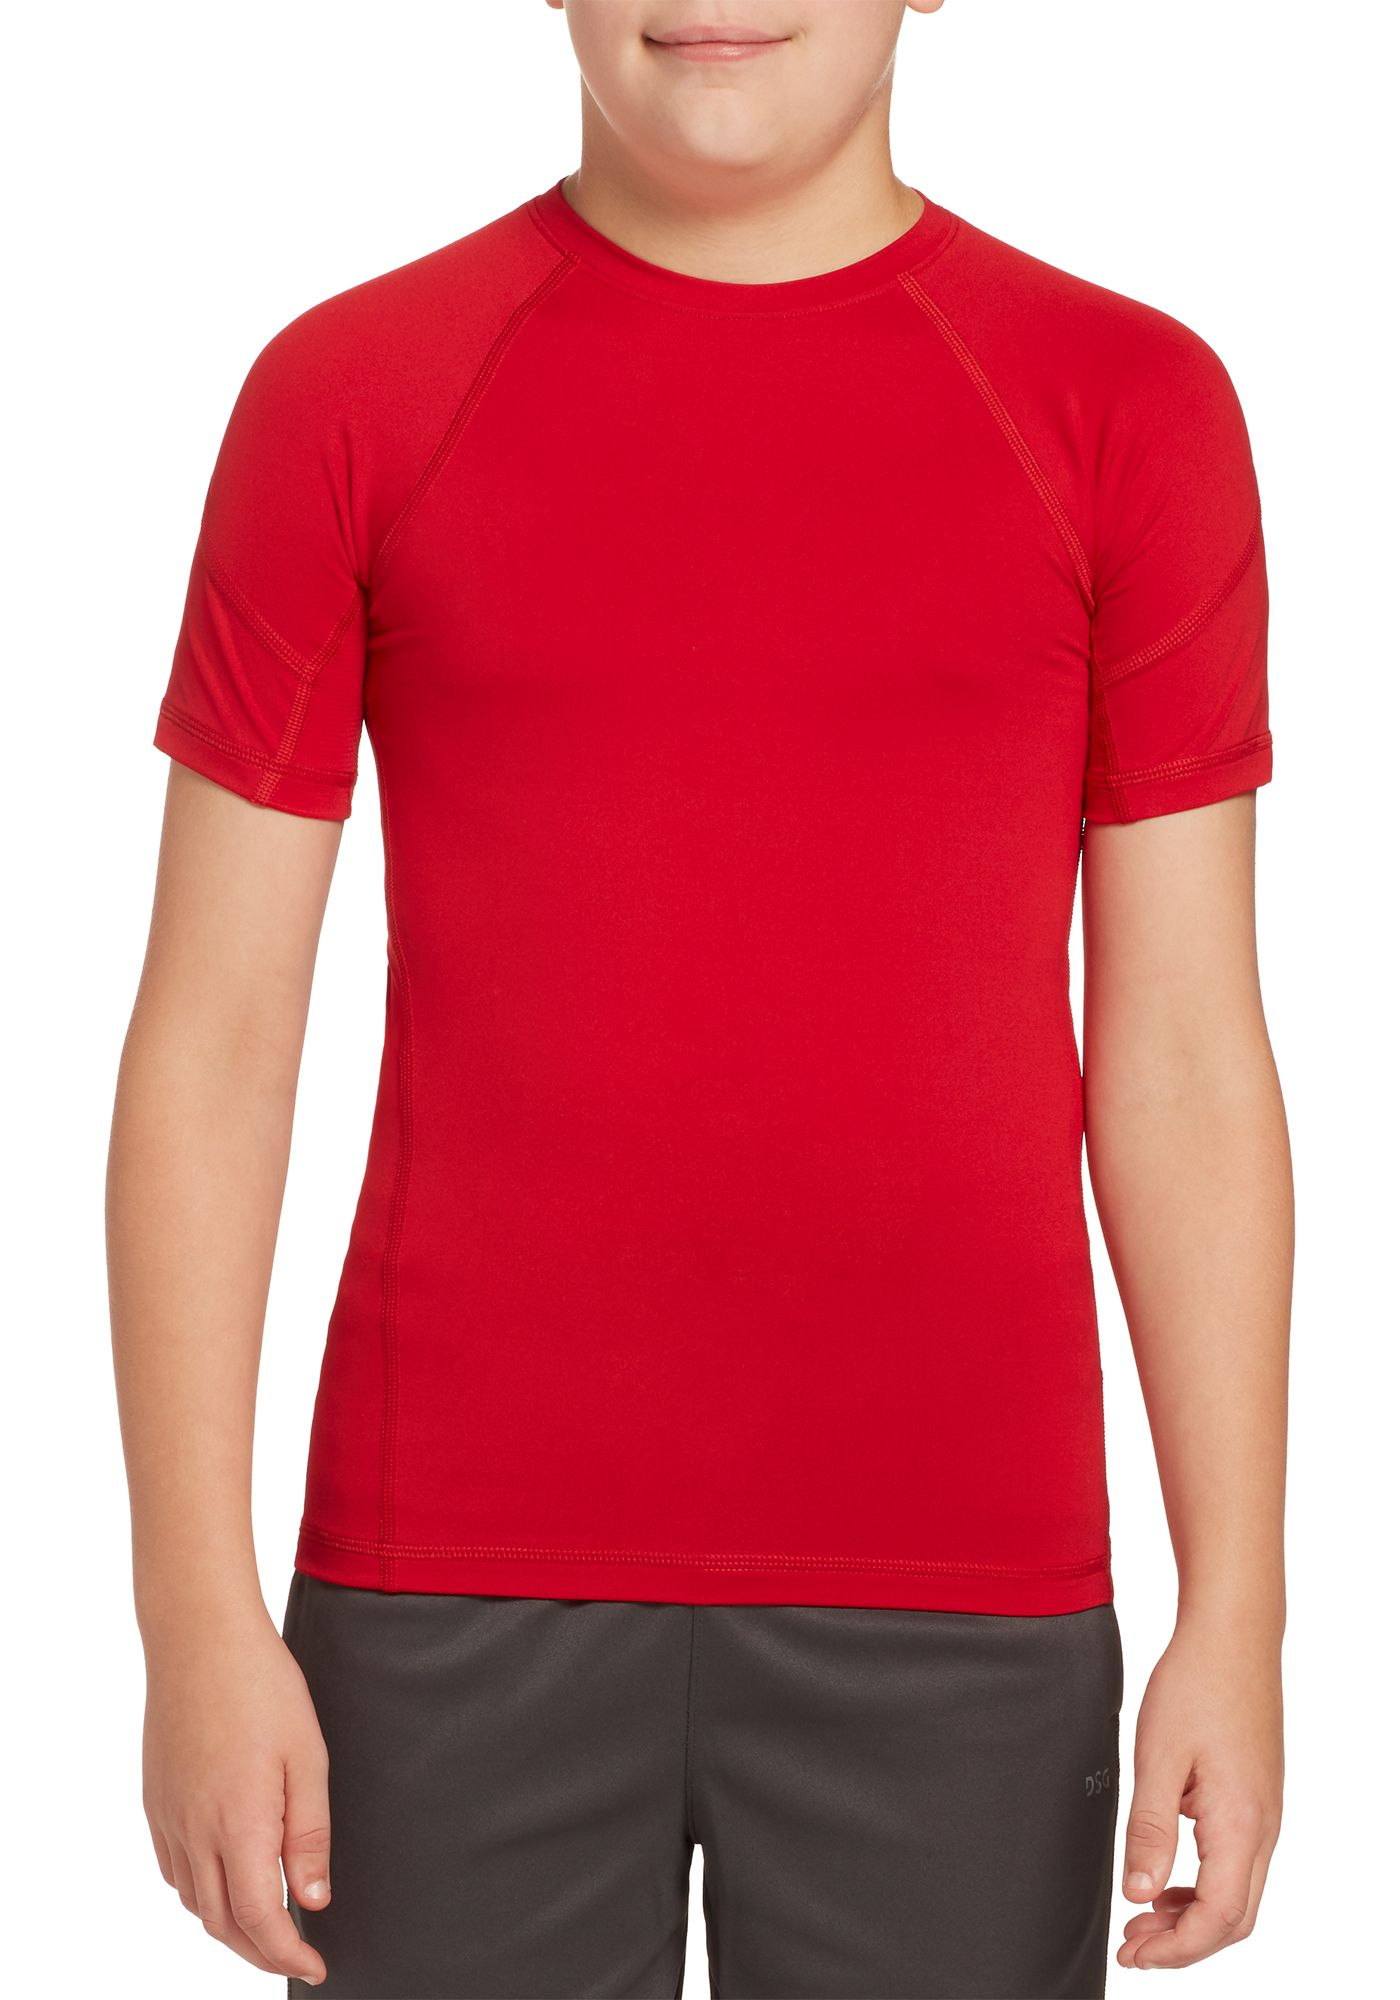 DSG Boys' Compression T-Shirt